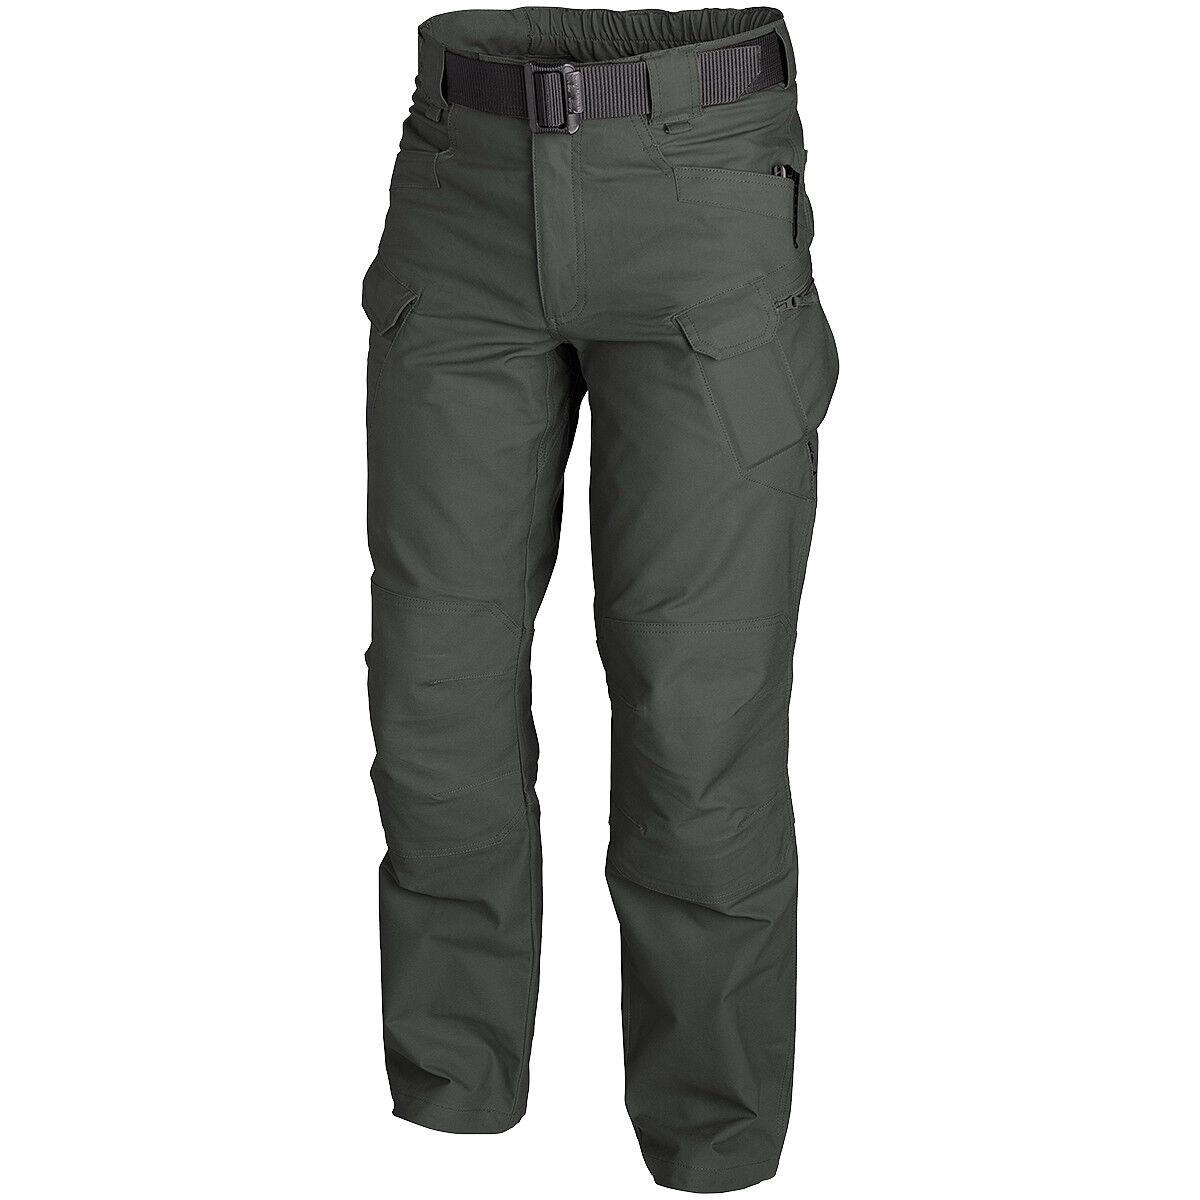 Helikon Urban Tactical Pants Herren Cargo Trekking Outdoorhose Jungle Grün